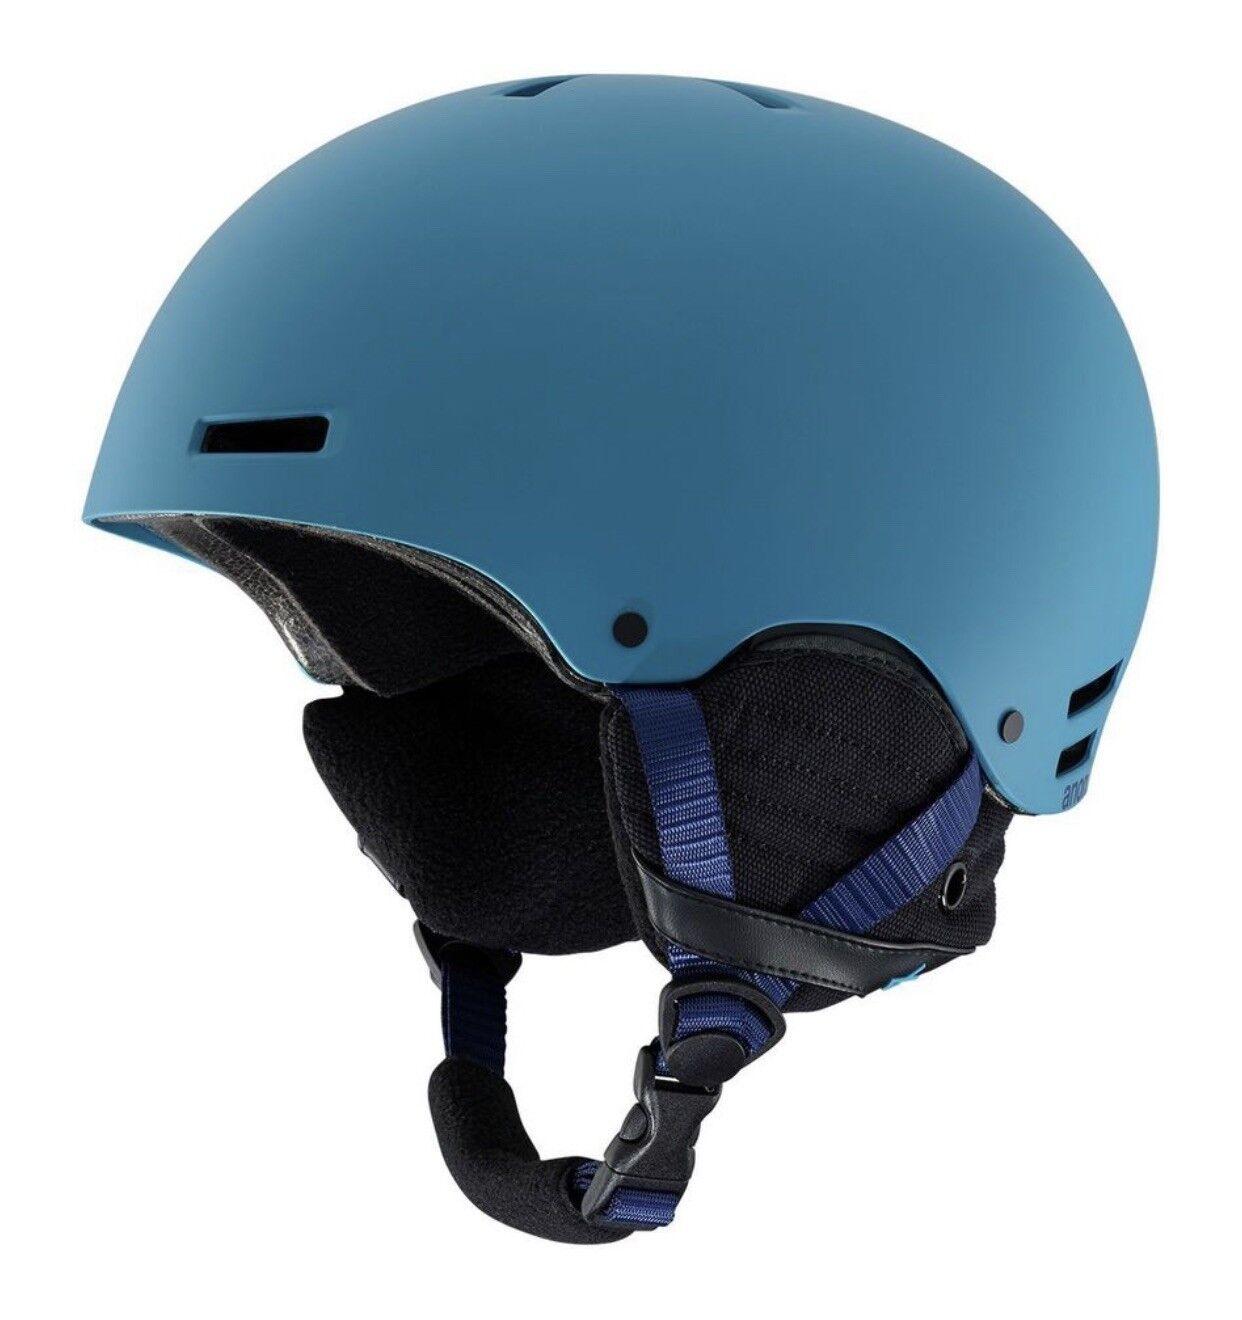 Burton Anon Raider bluee ski snowboard helmet Medium  Size  fast shipping